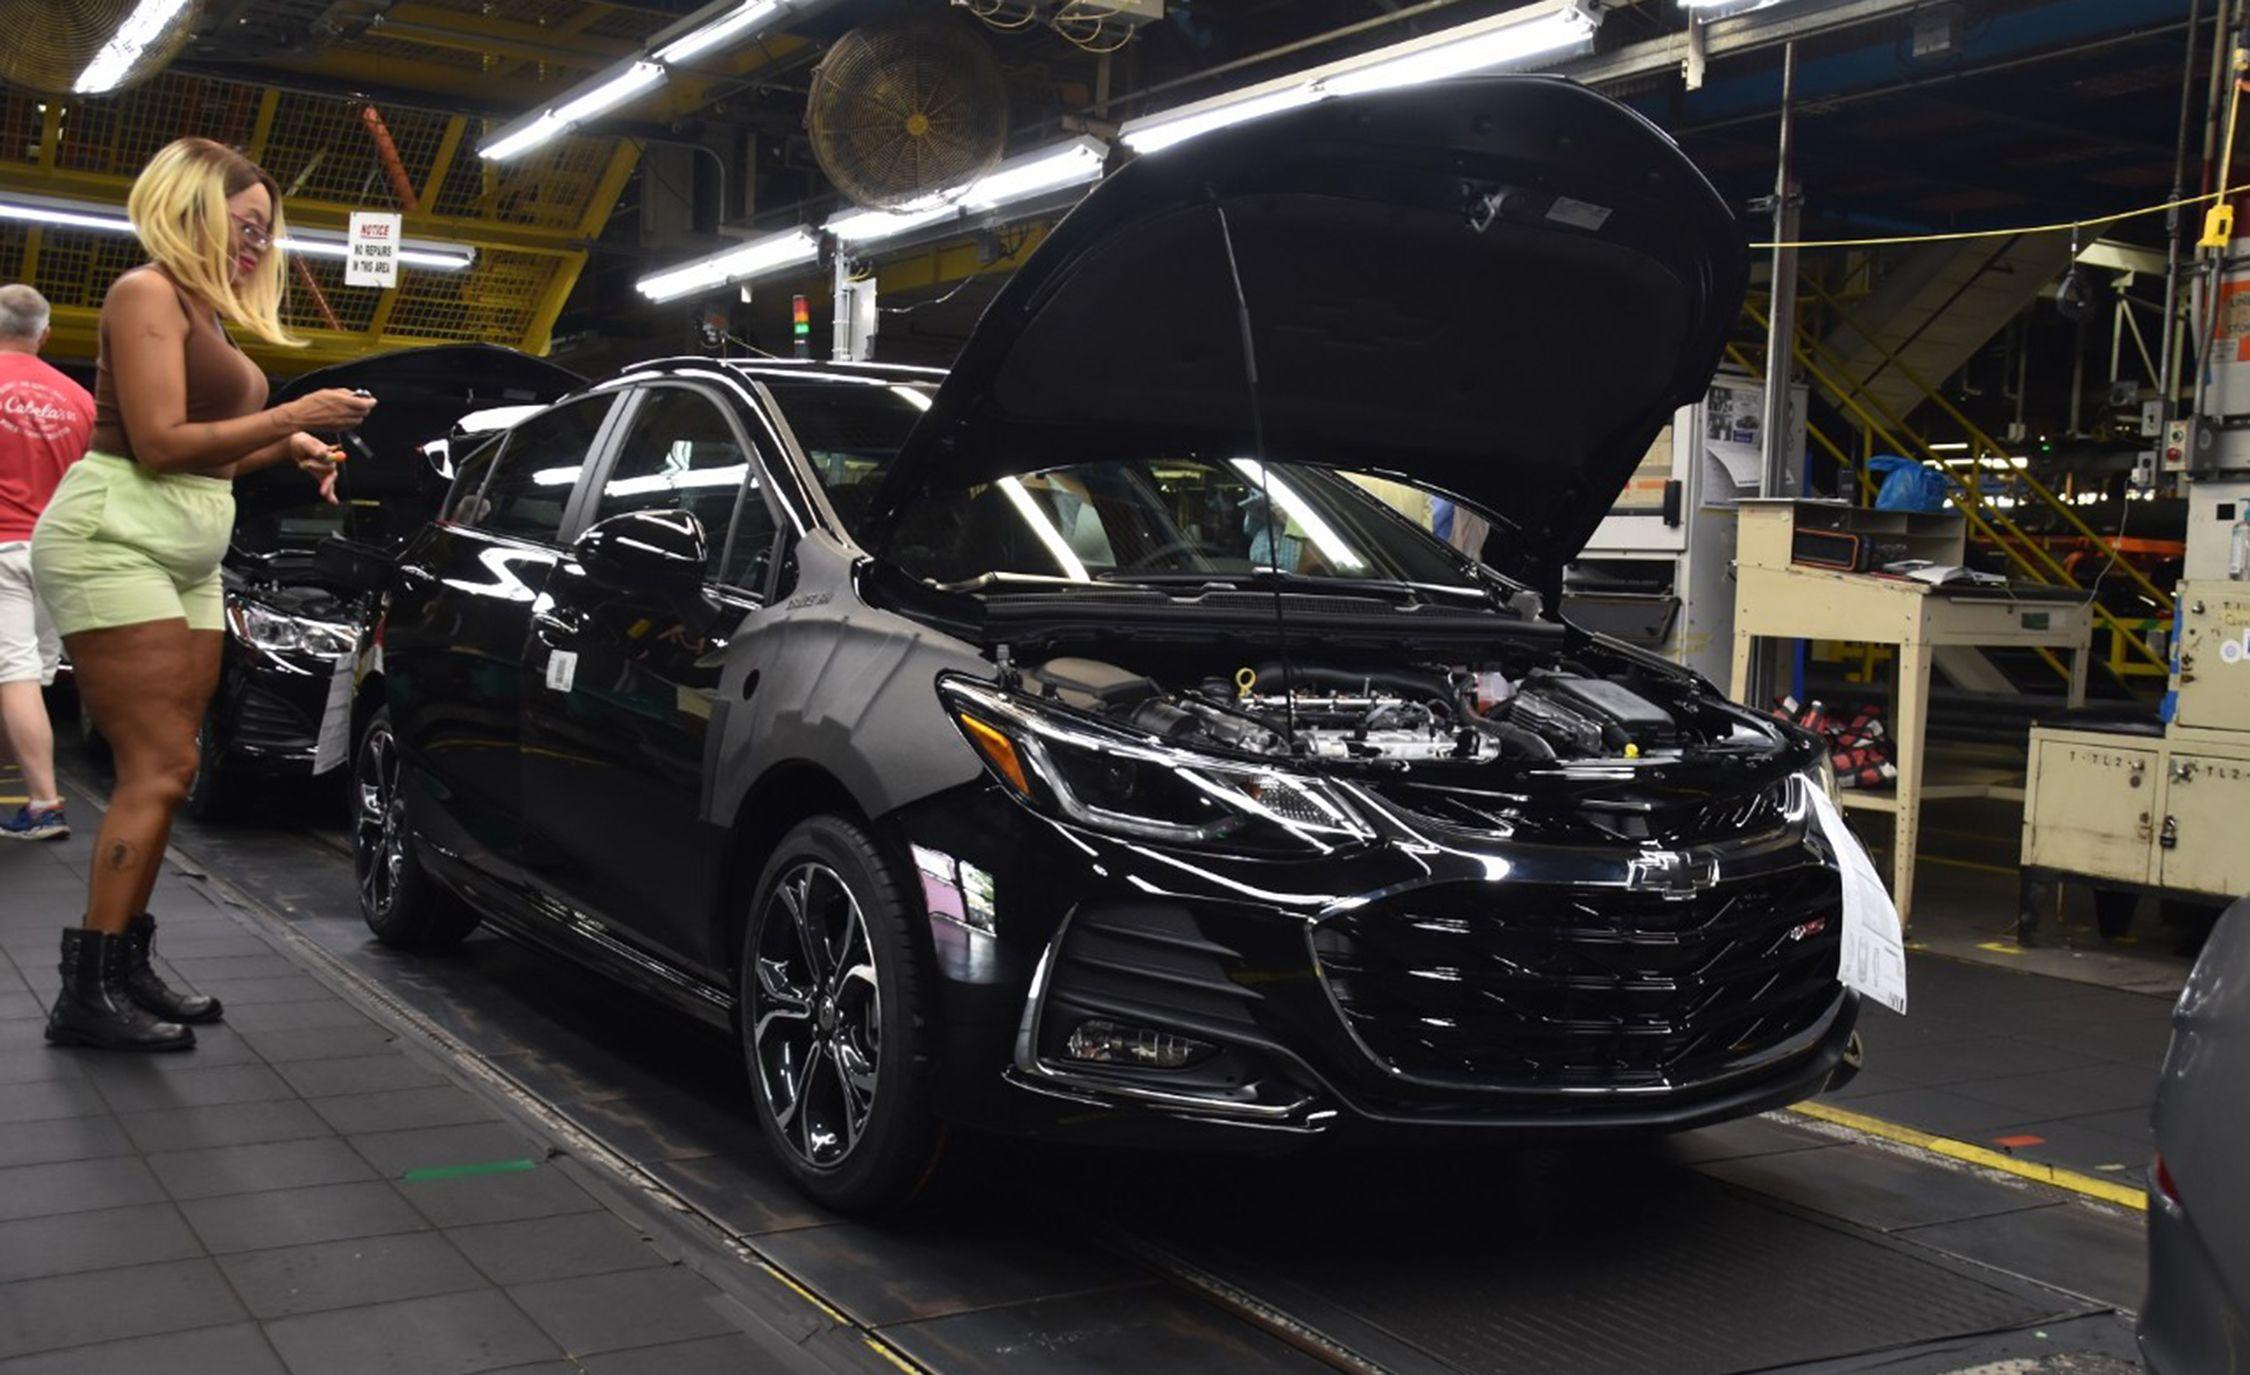 GM Closing Plants — Chevrolet, Cadillac, Buick Models Ending